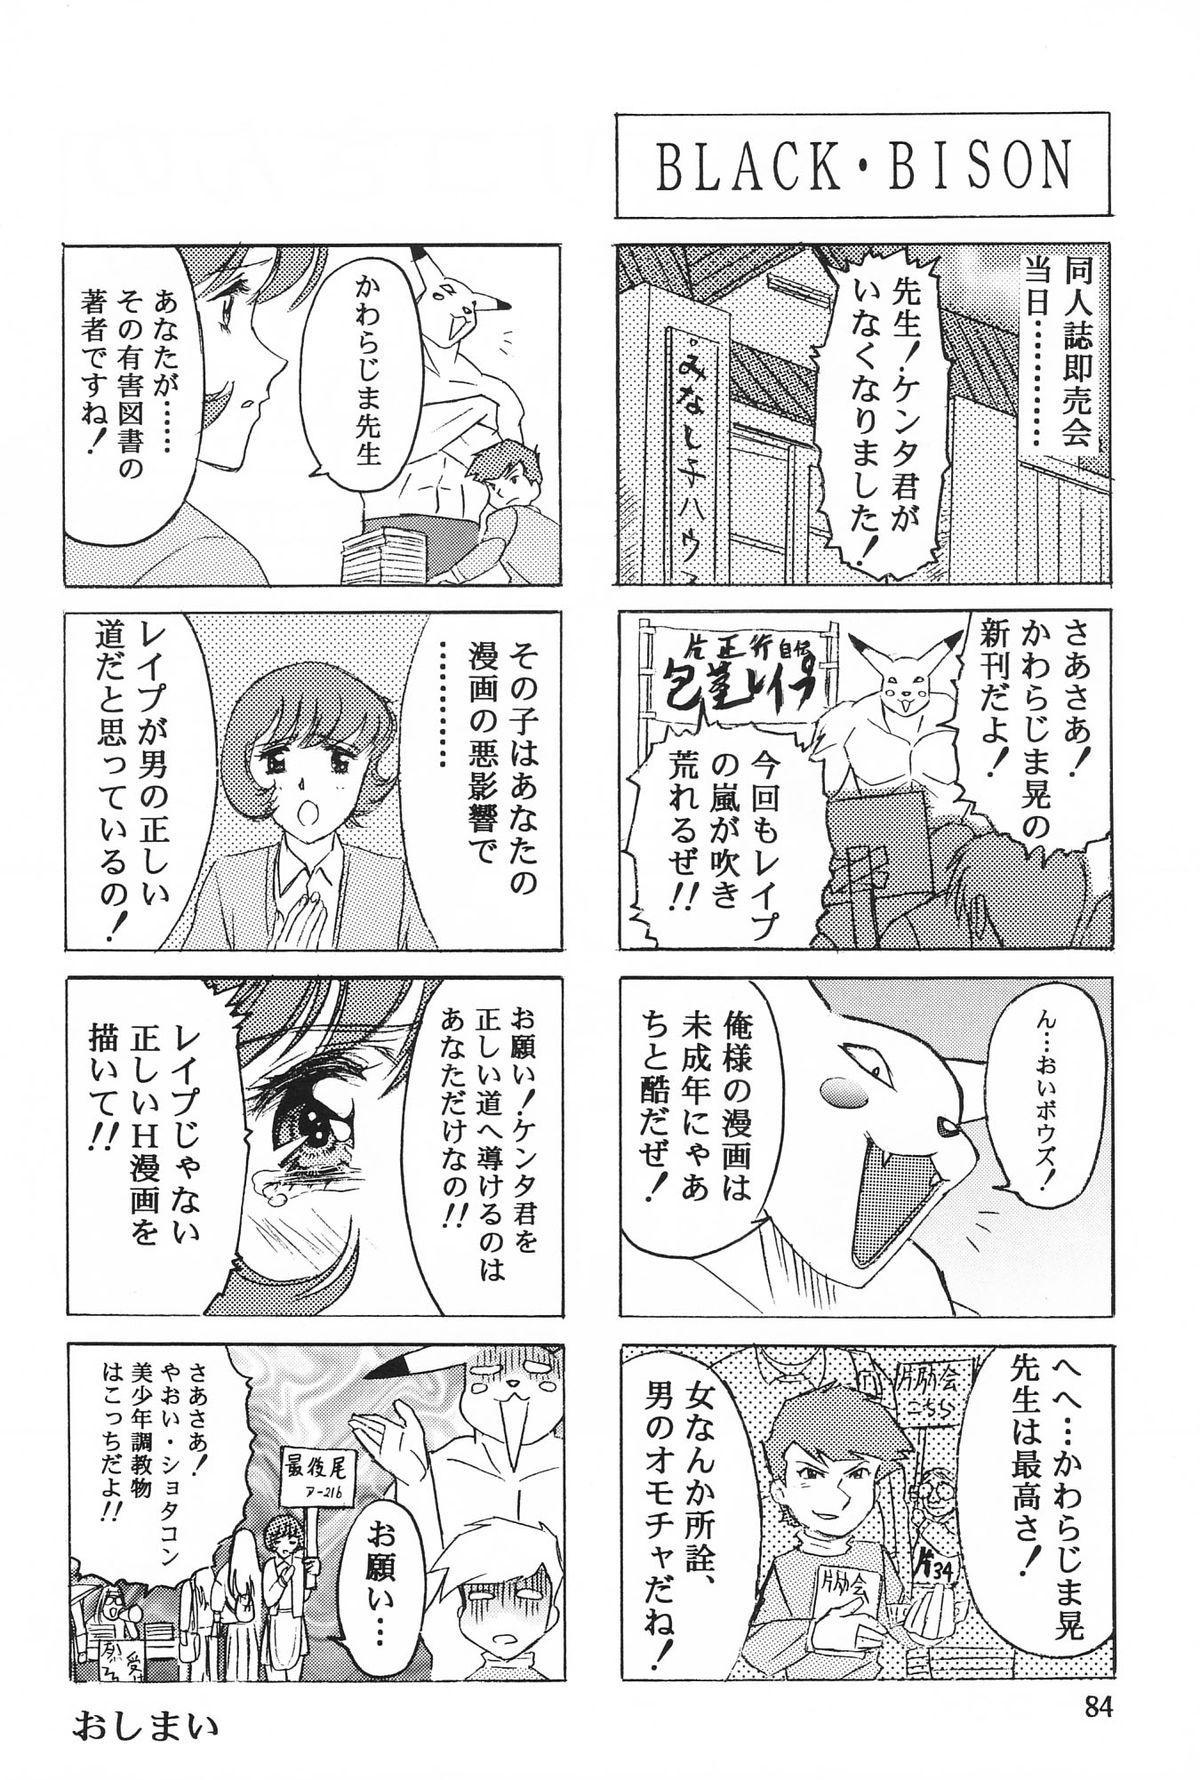 Henrei-kai '98 Natsu SPECIAL 83